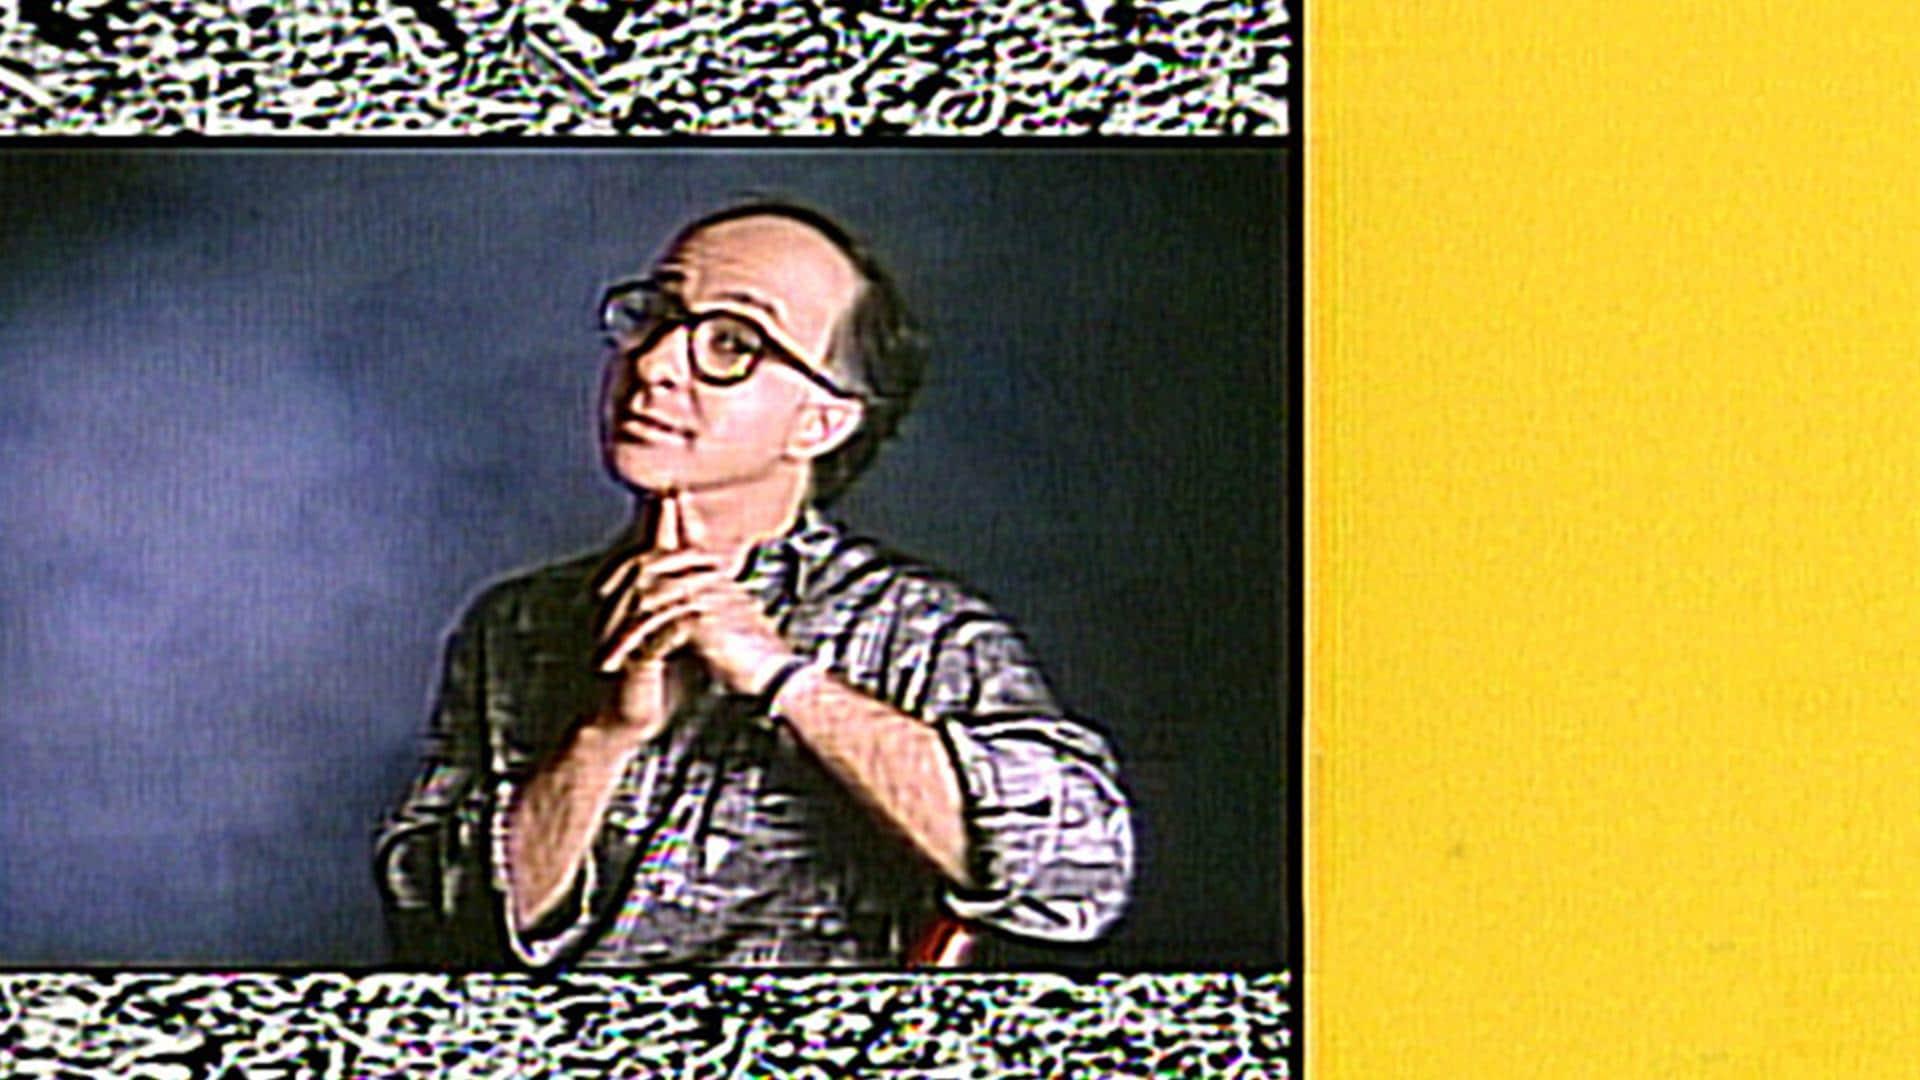 Paul Shaffer: January 31, 1987